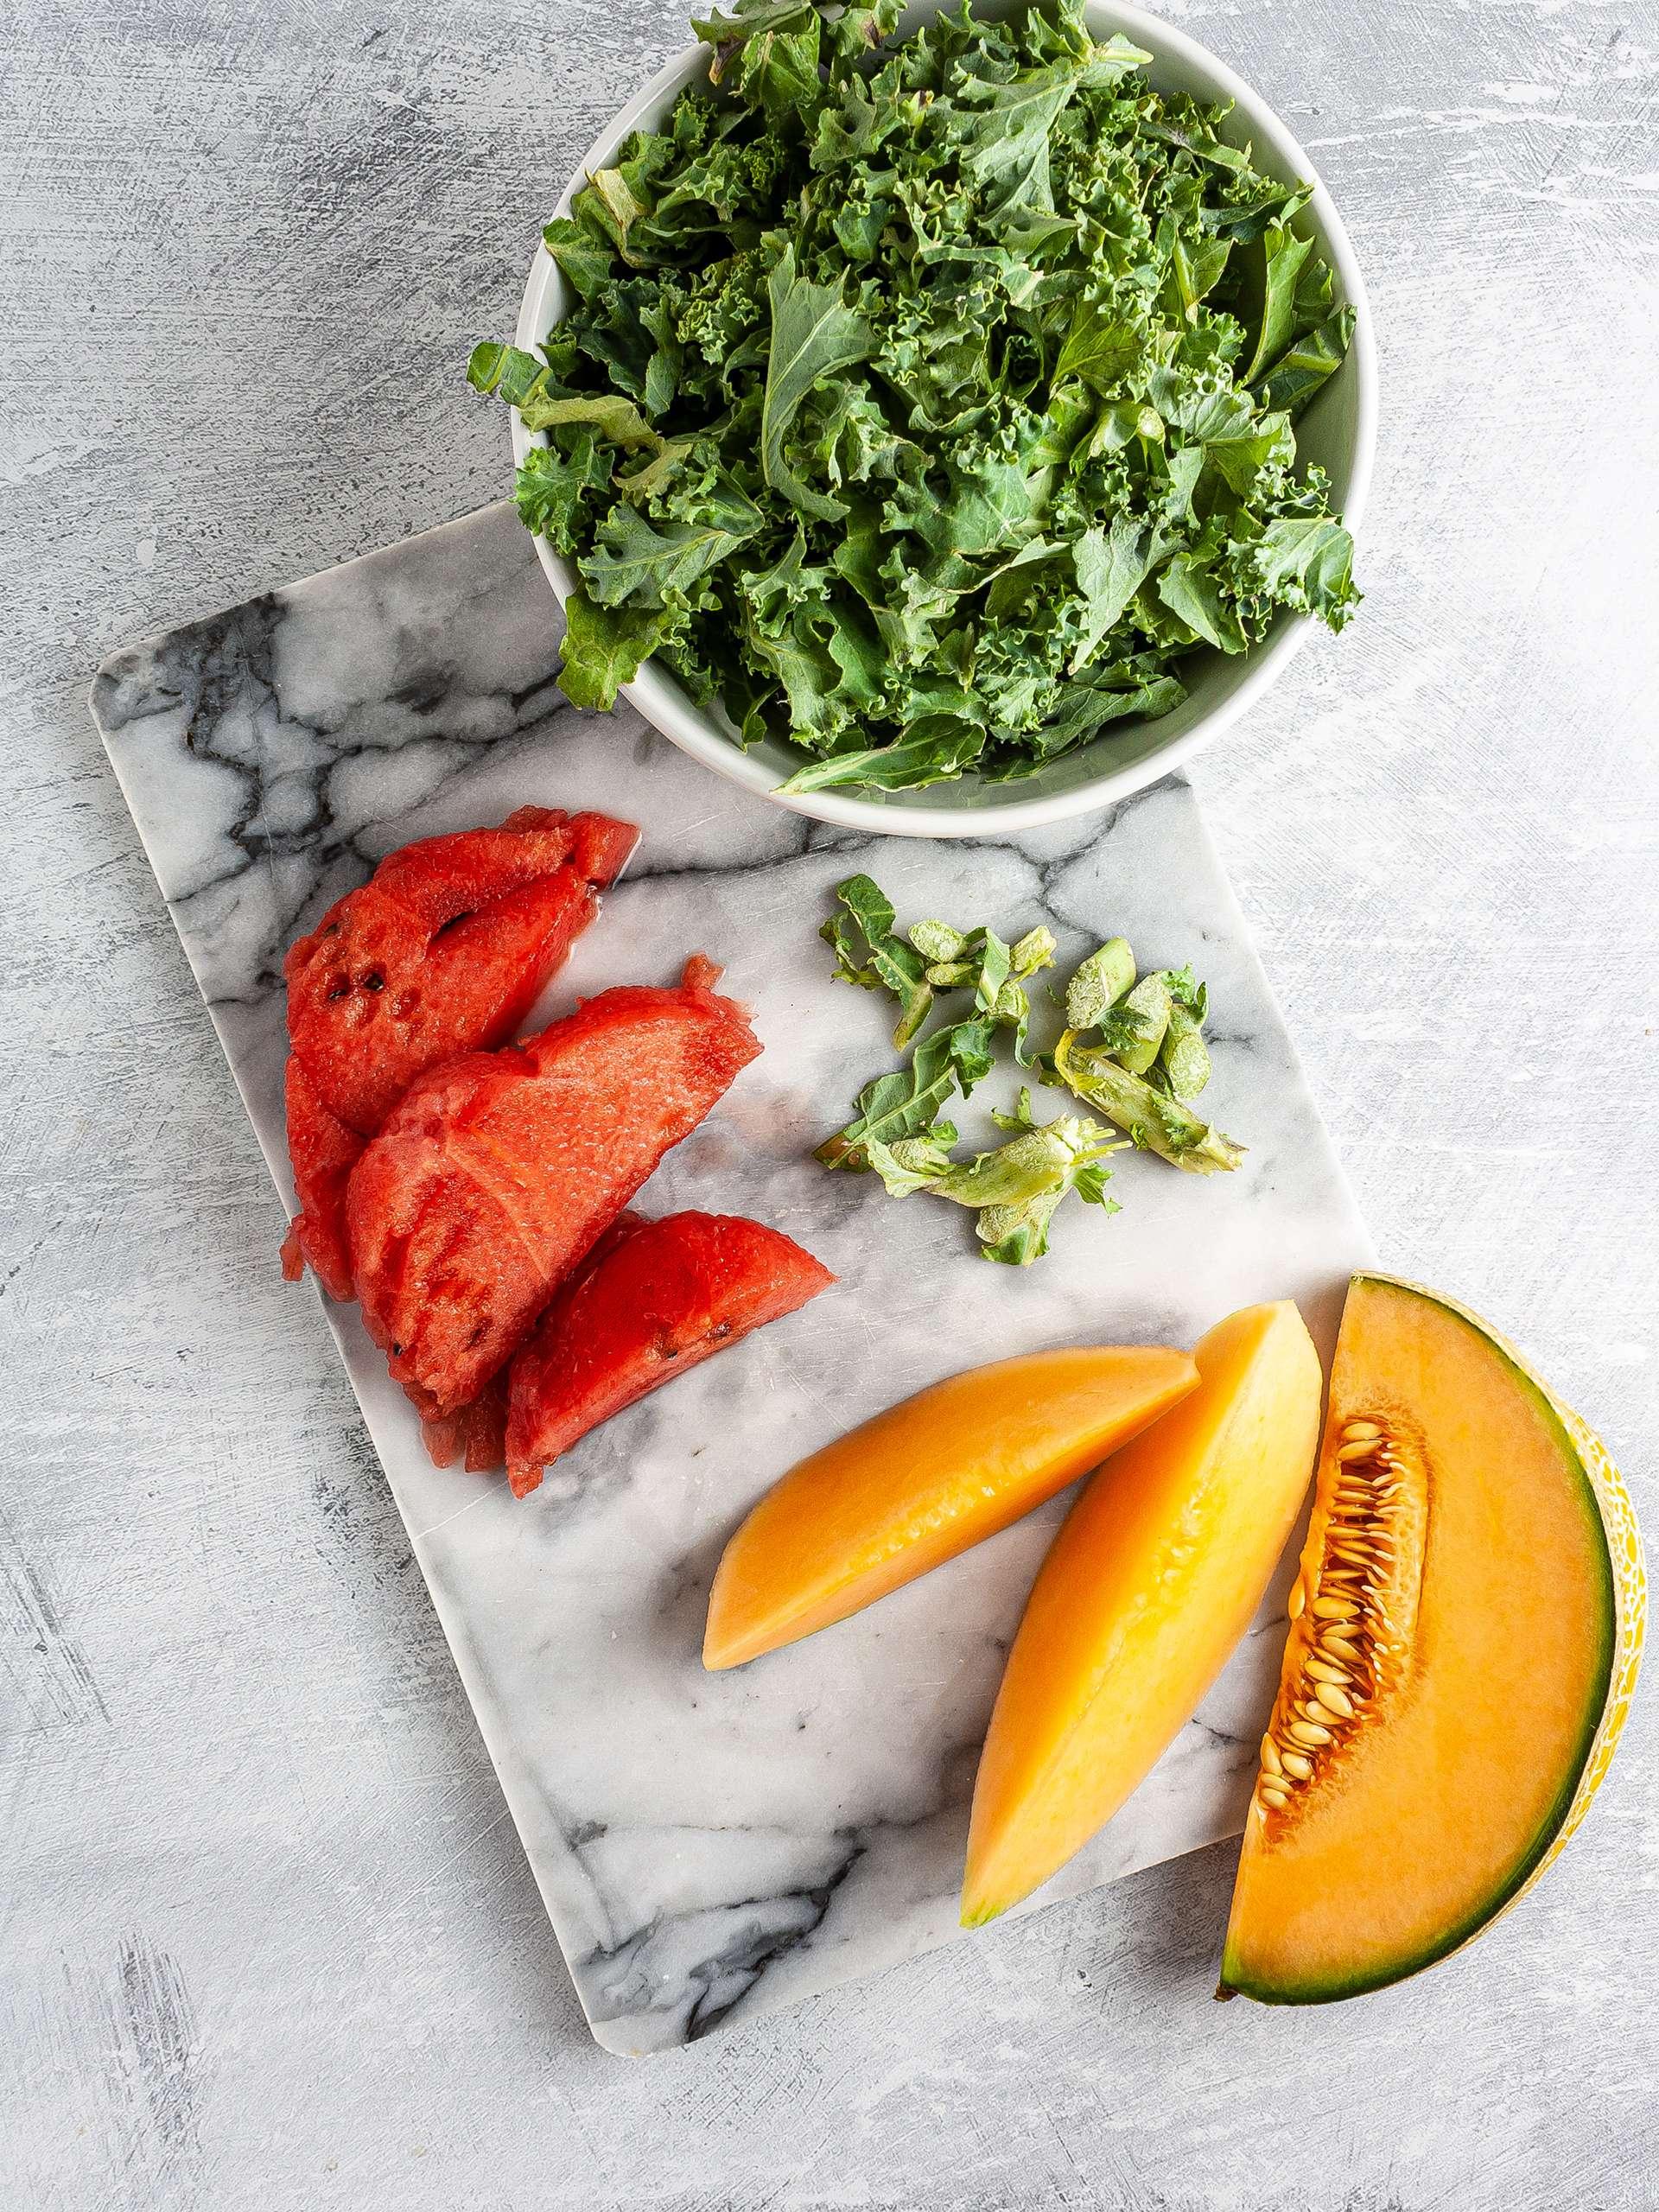 Shredded kale, sliced melon and watermelon